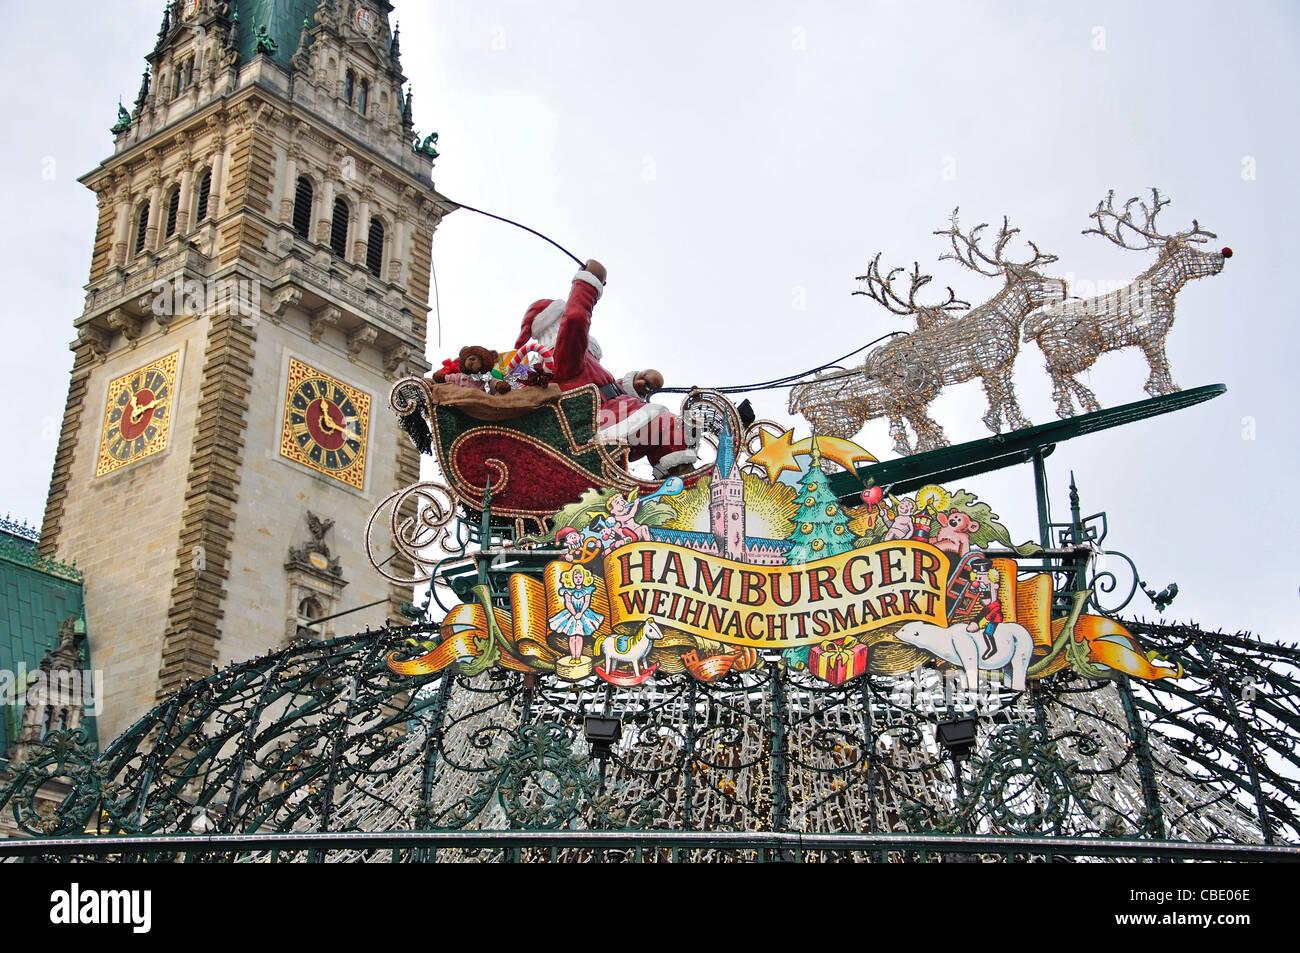 Entrance sign to Christmas Market, Rathausplatz, Hamburg, Hamburg Metropolitan Region, Federal Republic of Germany - Stock Image